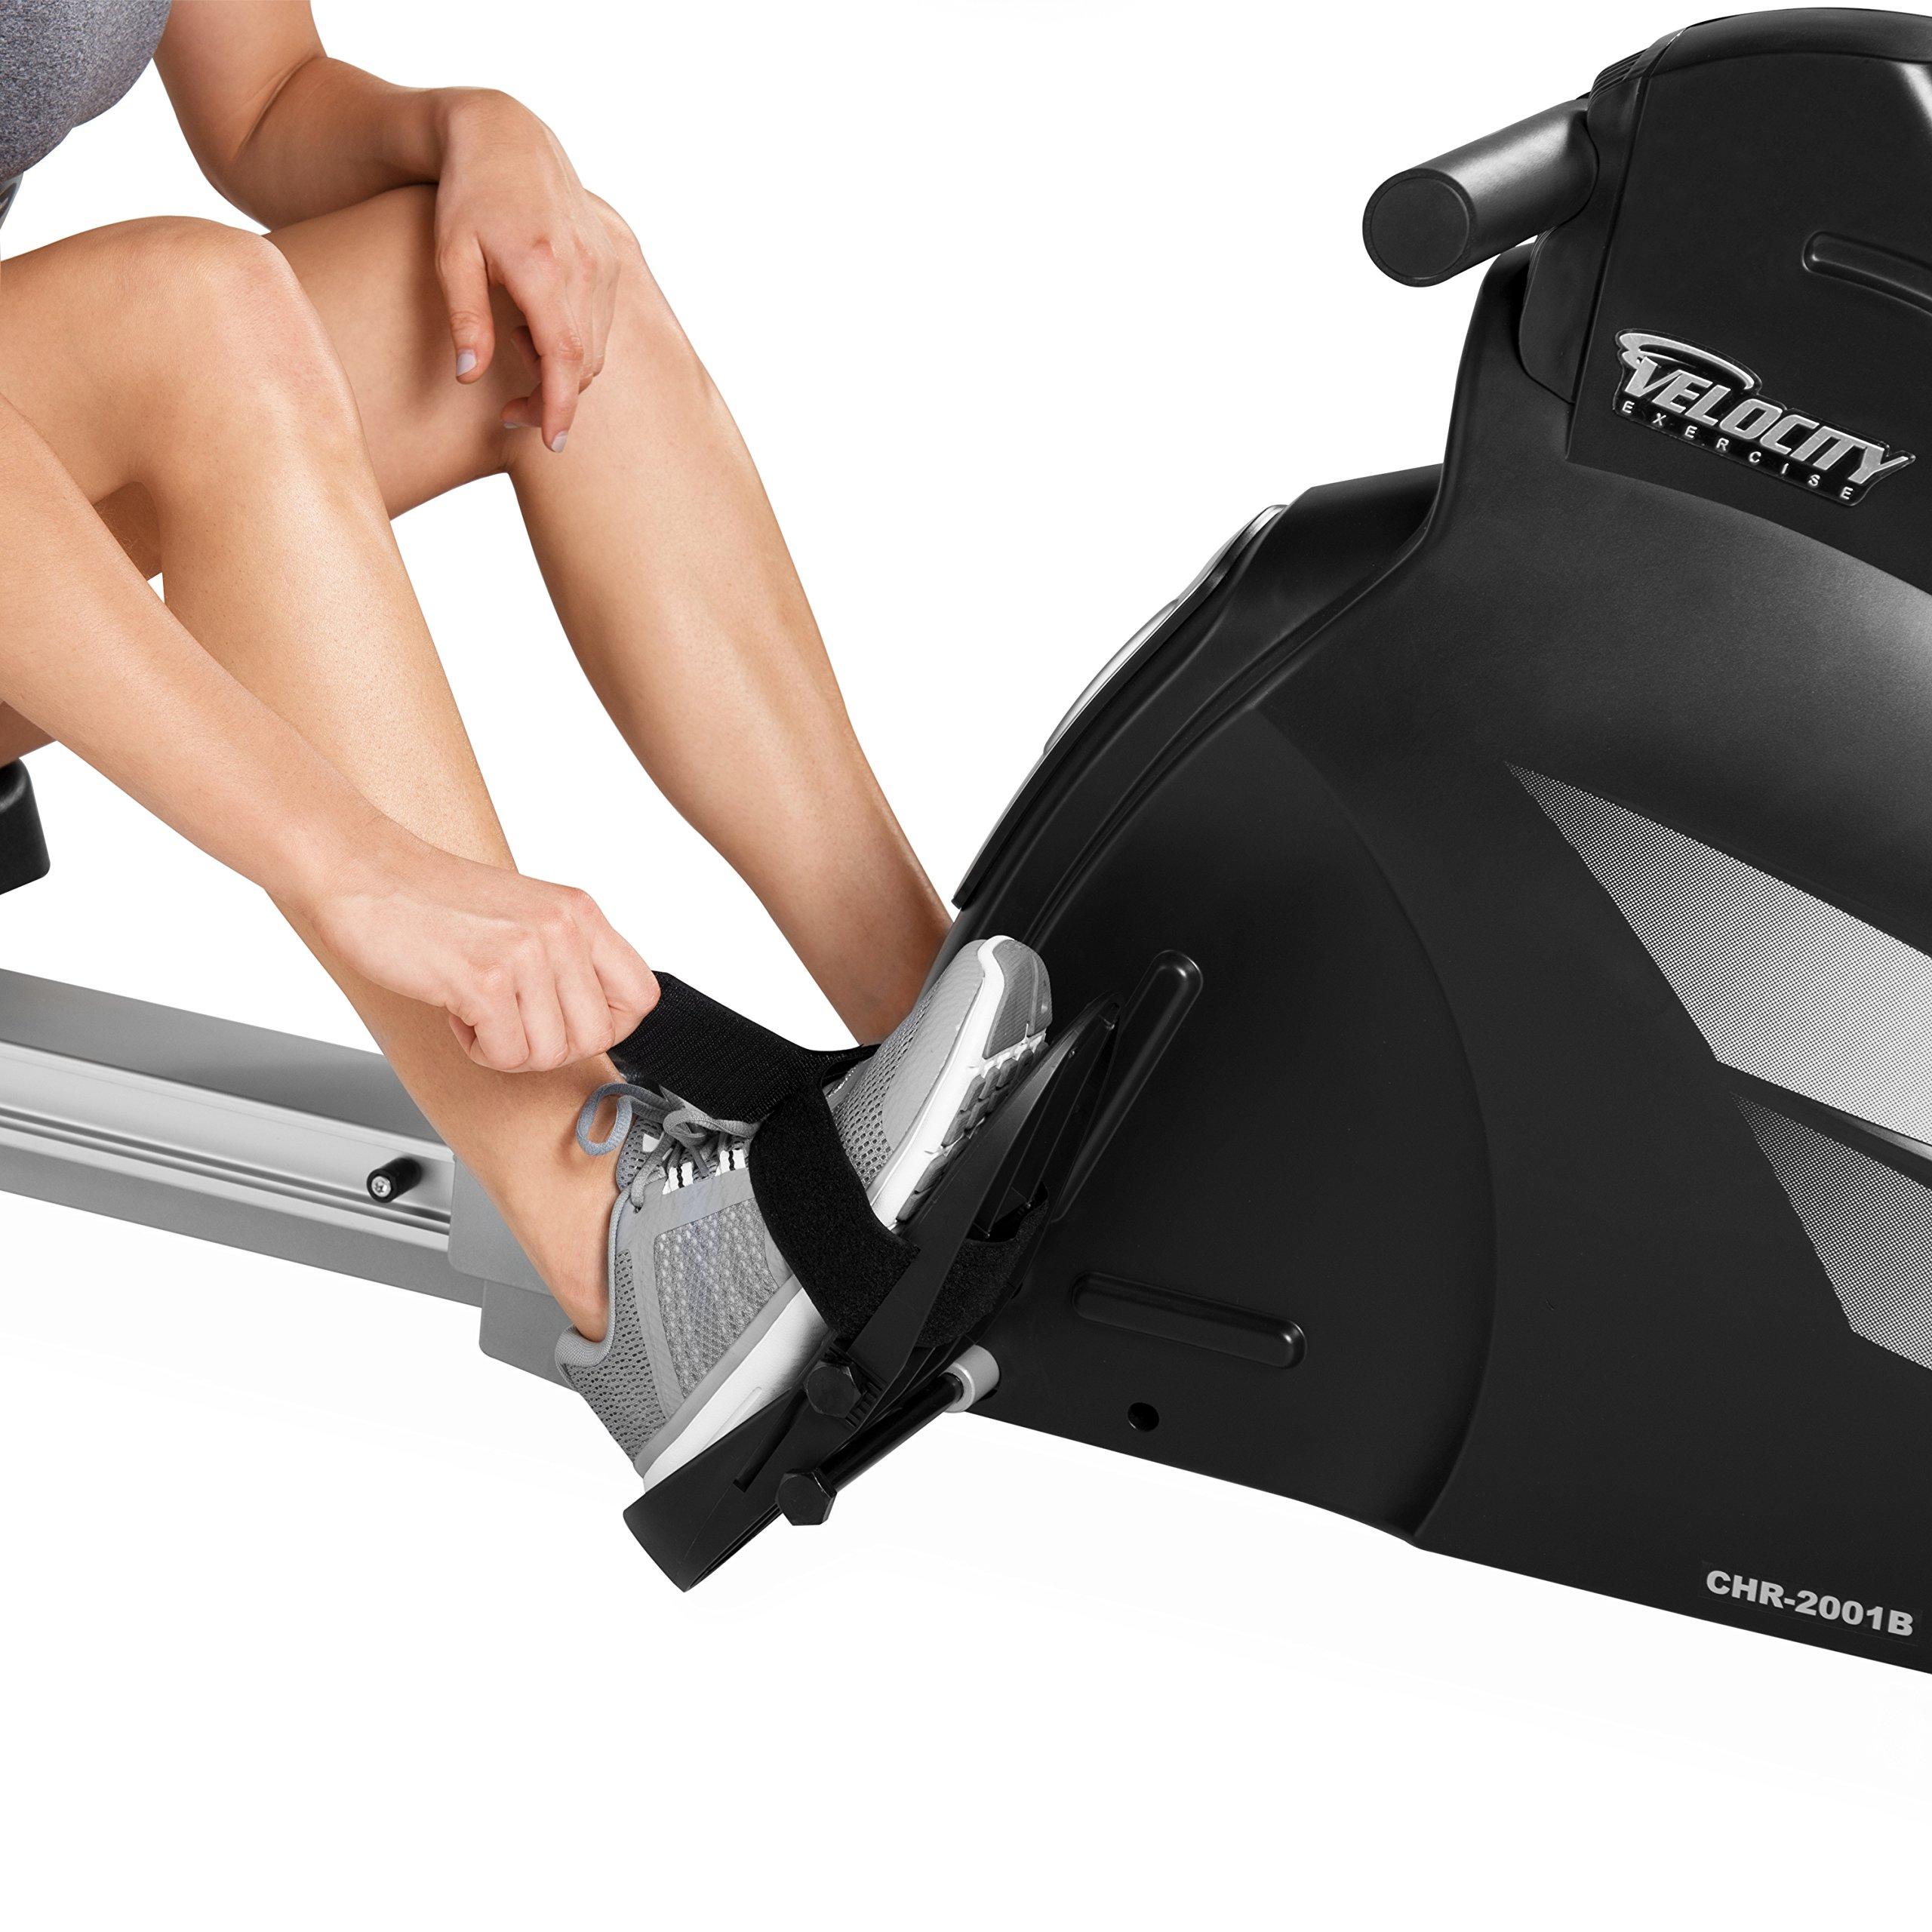 Velocity Exercise Magnetic Rower, Black by velocityexercise (Image #5)